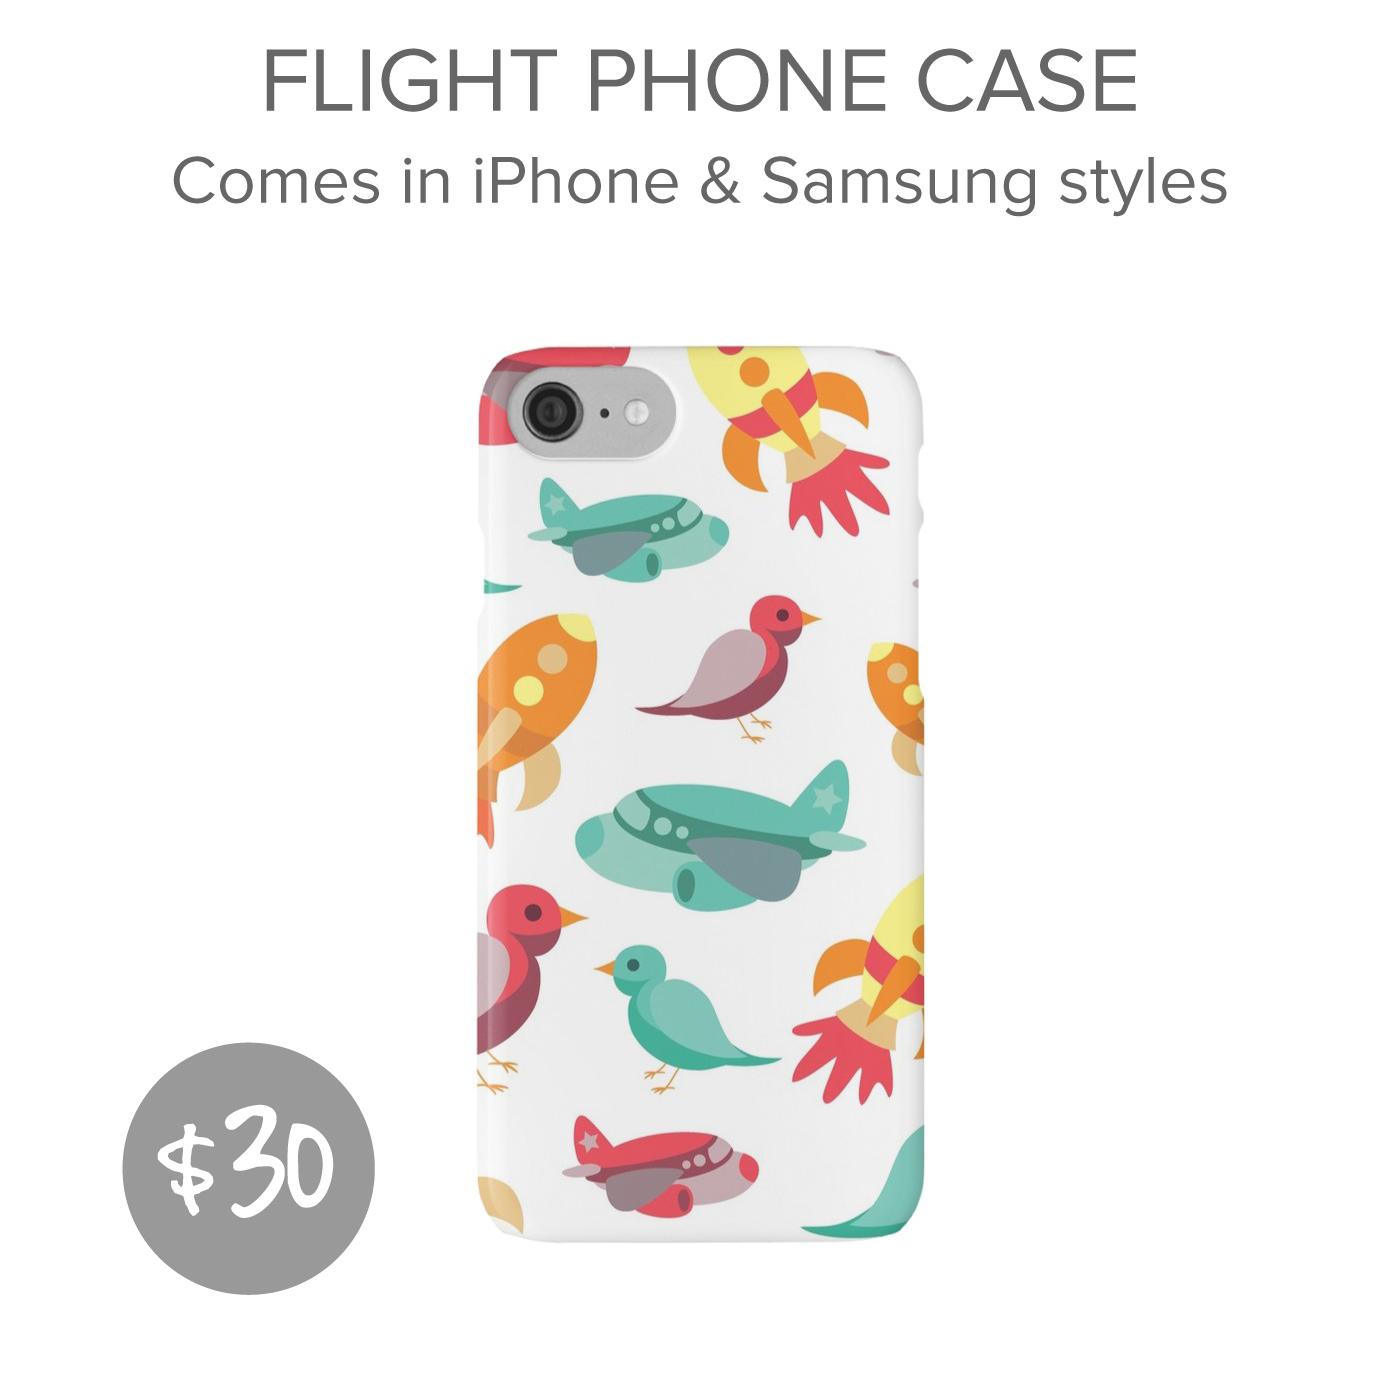 FLIGHT-PHONE-CASE.jpg